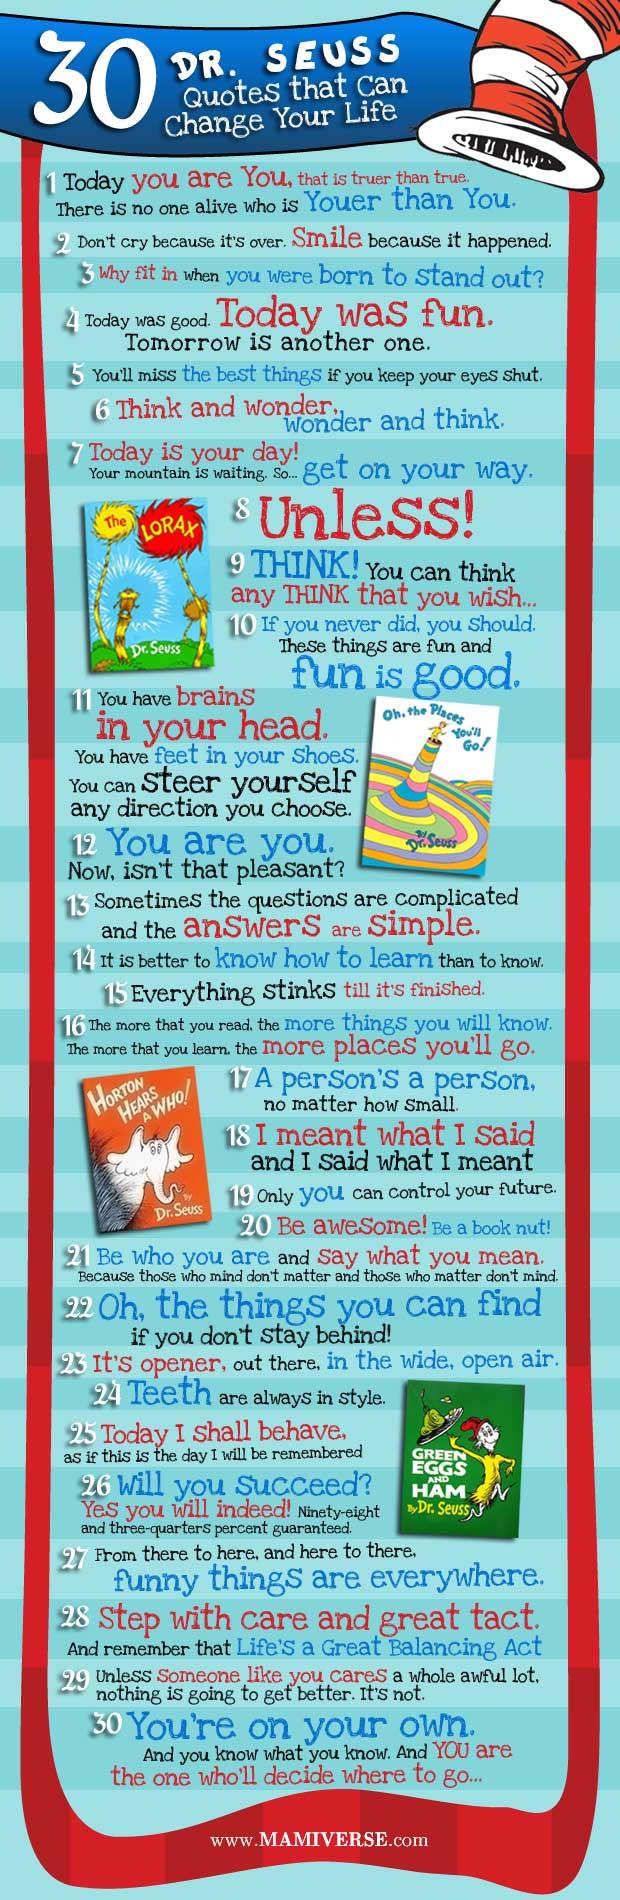 Seuss_quotes